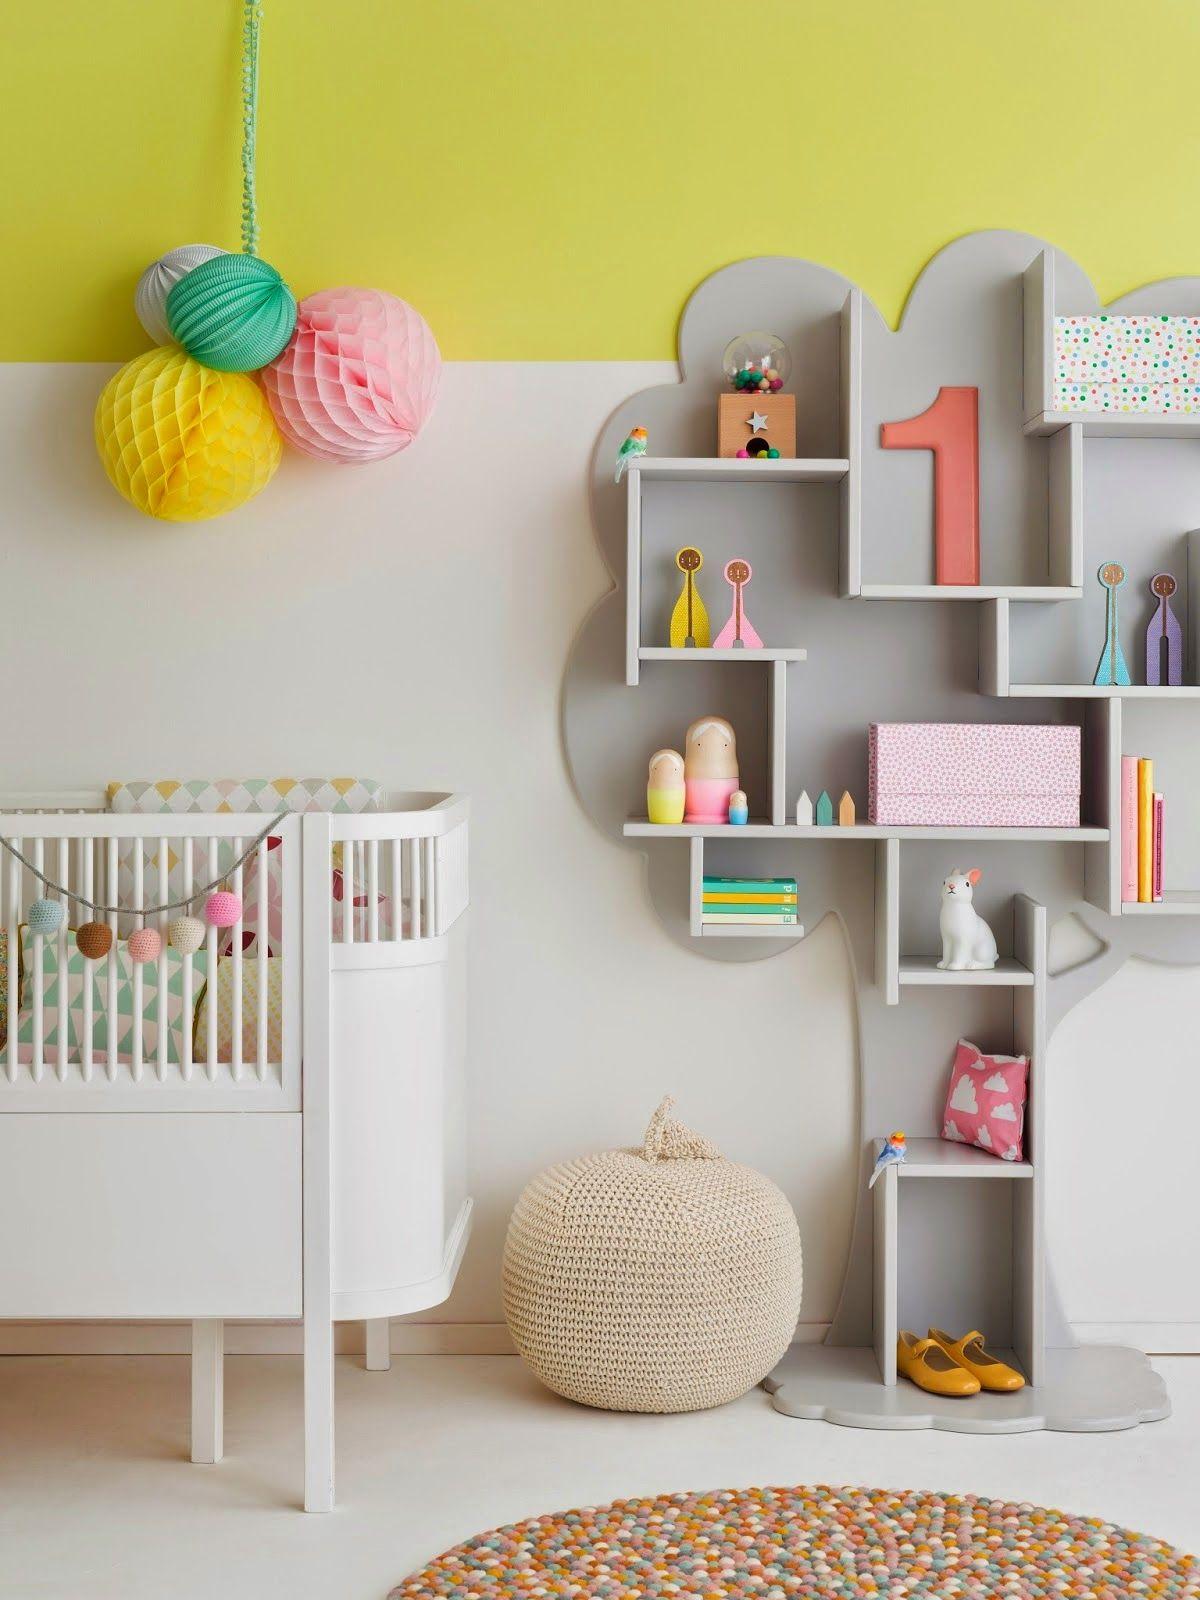 Awesome tree bookshelf!!  Would be easy to make too!